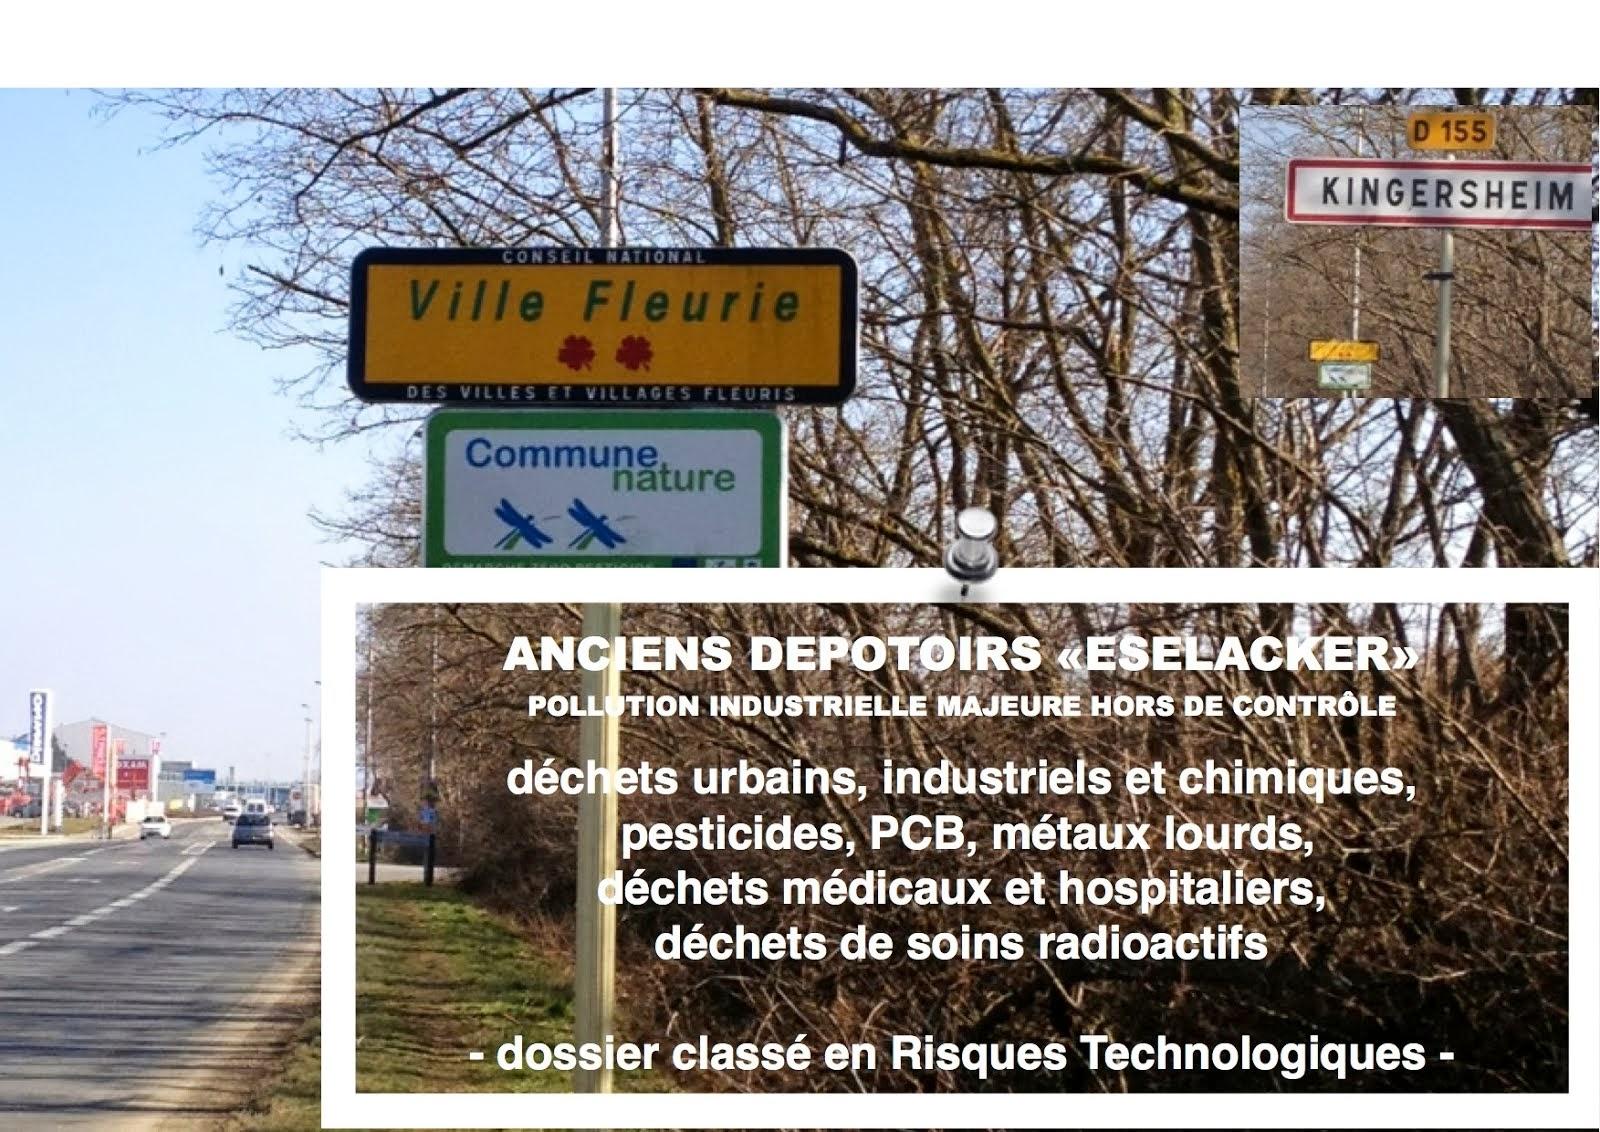 Kingersheim, Cadastre Toxique, Méga Spot d'anciens dépotoirs